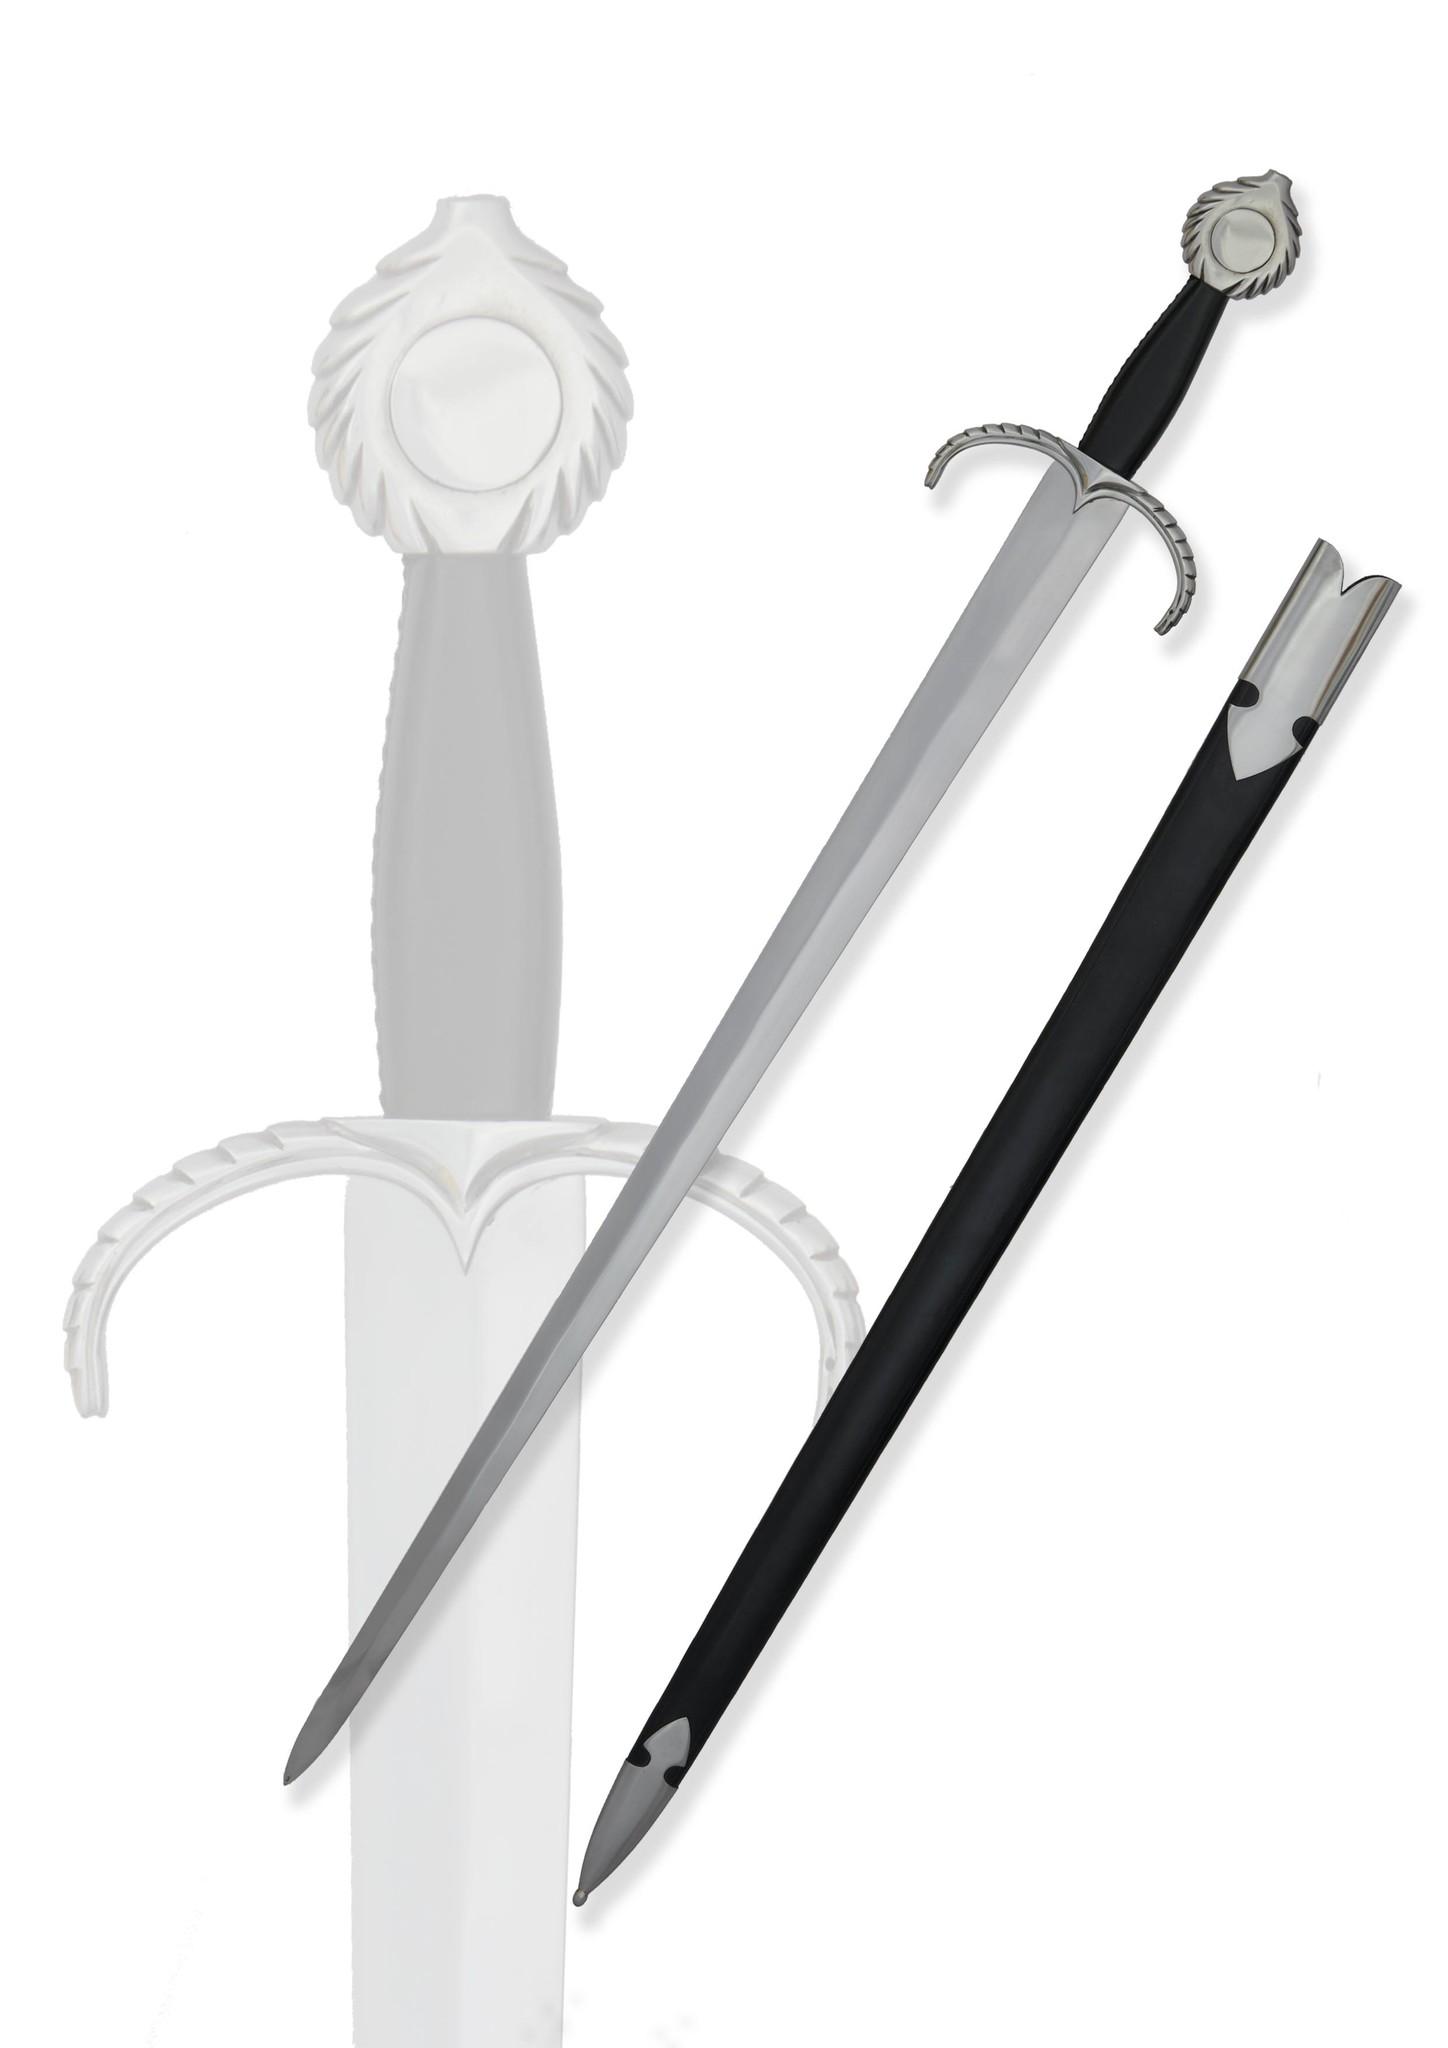 Arabian fantasy sword